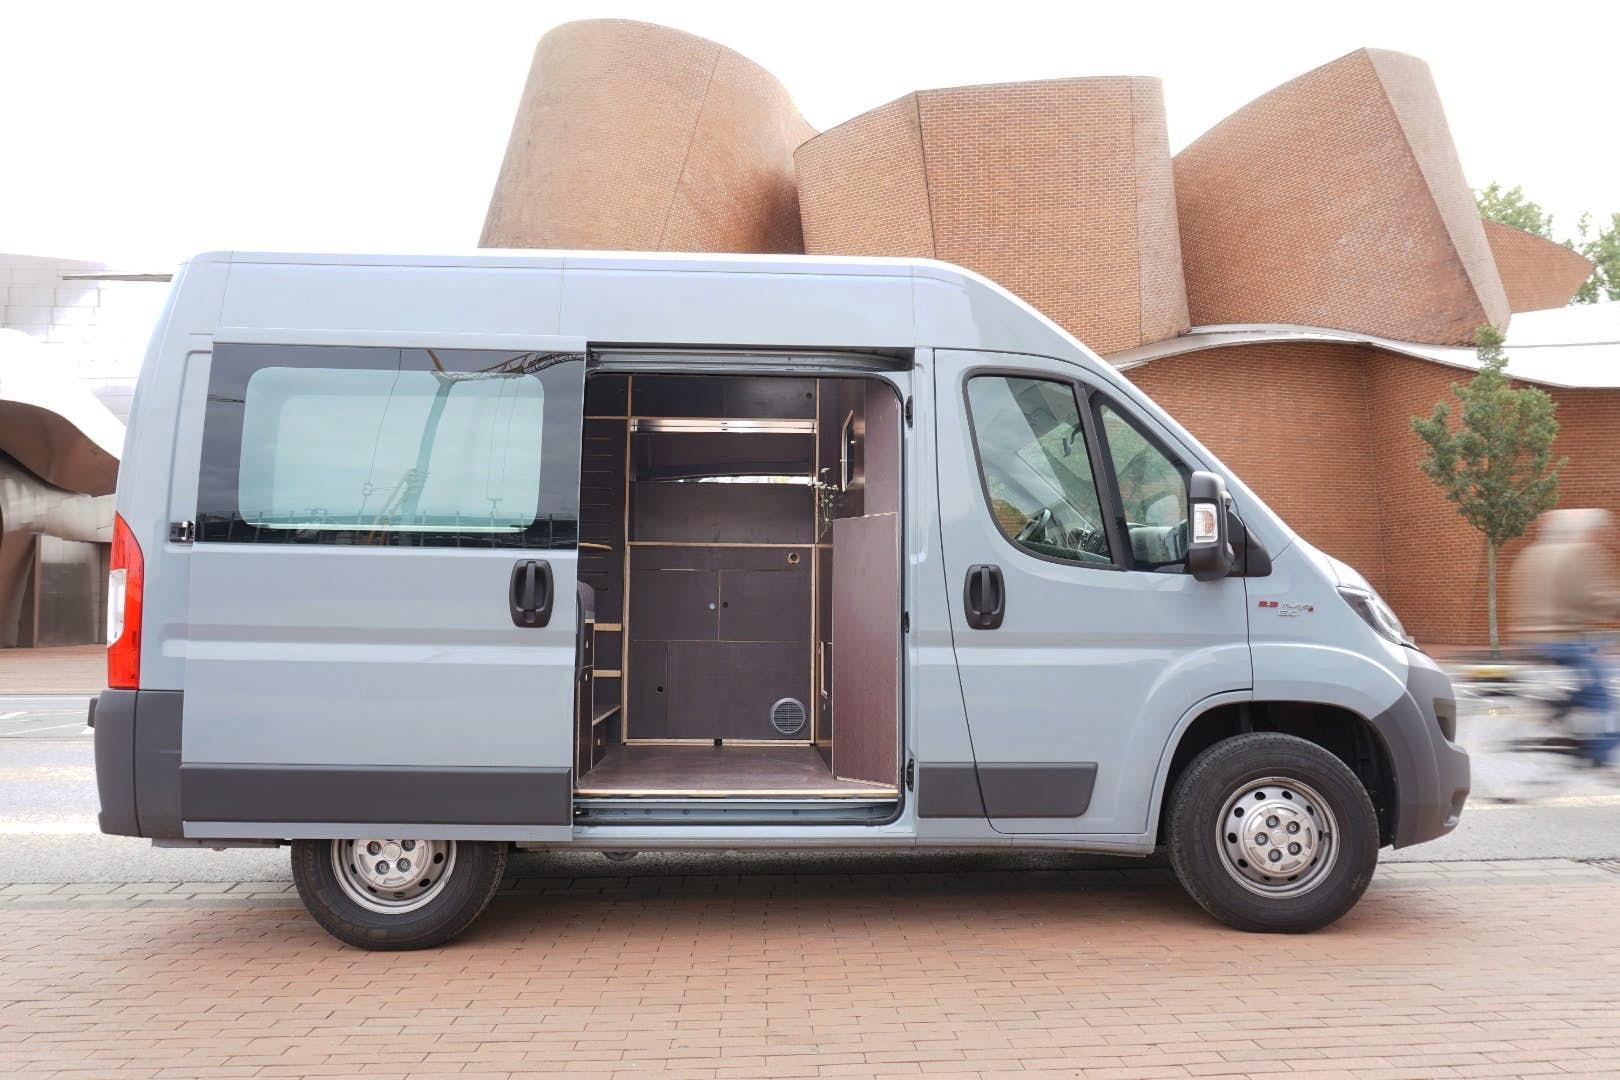 Minimalist camper van packs everything you need in 48 square feet